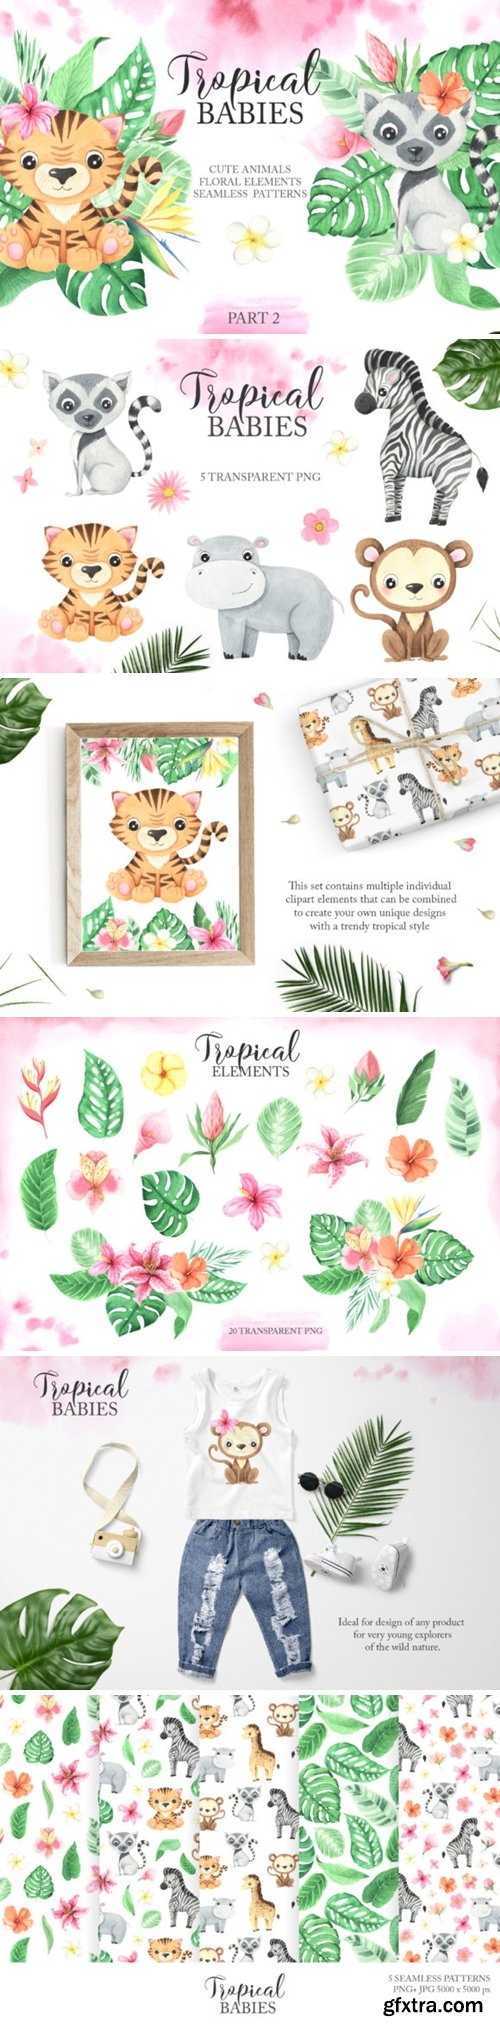 Watercolor Tropical Babies Set 2 3673153